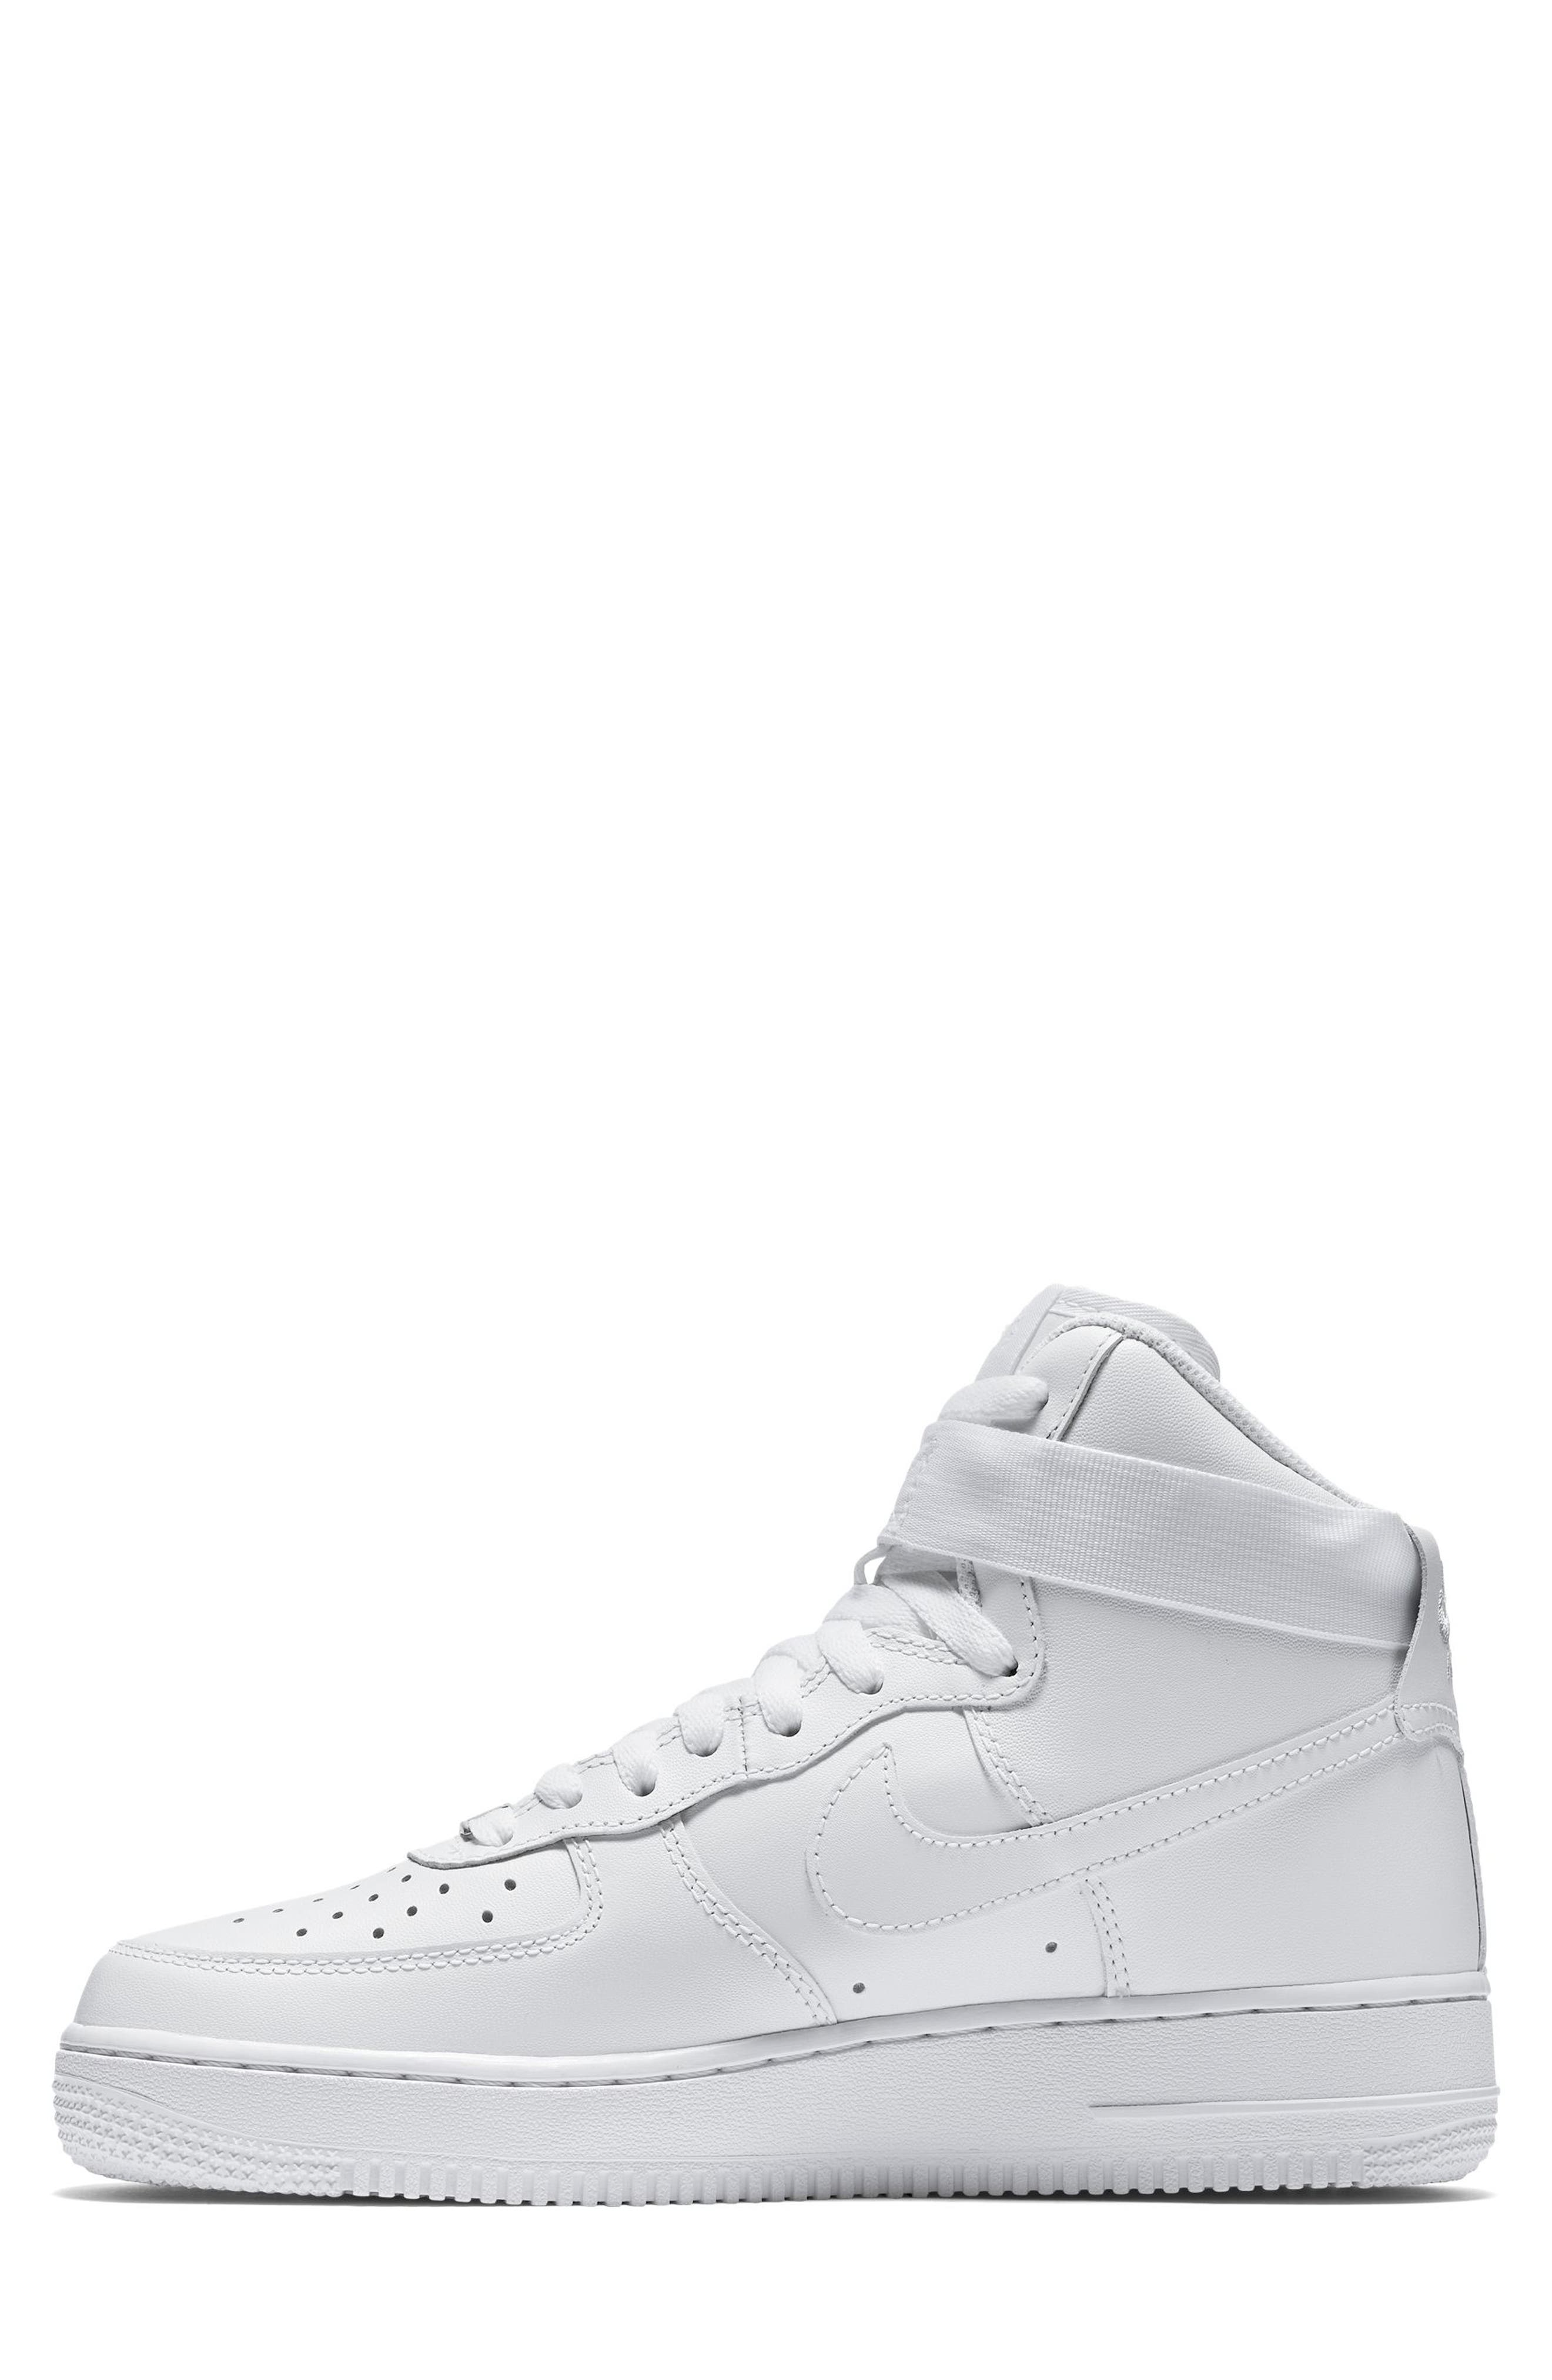 NIKE, Air Force 1 High Top Sneaker, Alternate thumbnail 3, color, WHITE/ WHITE/ WHITE